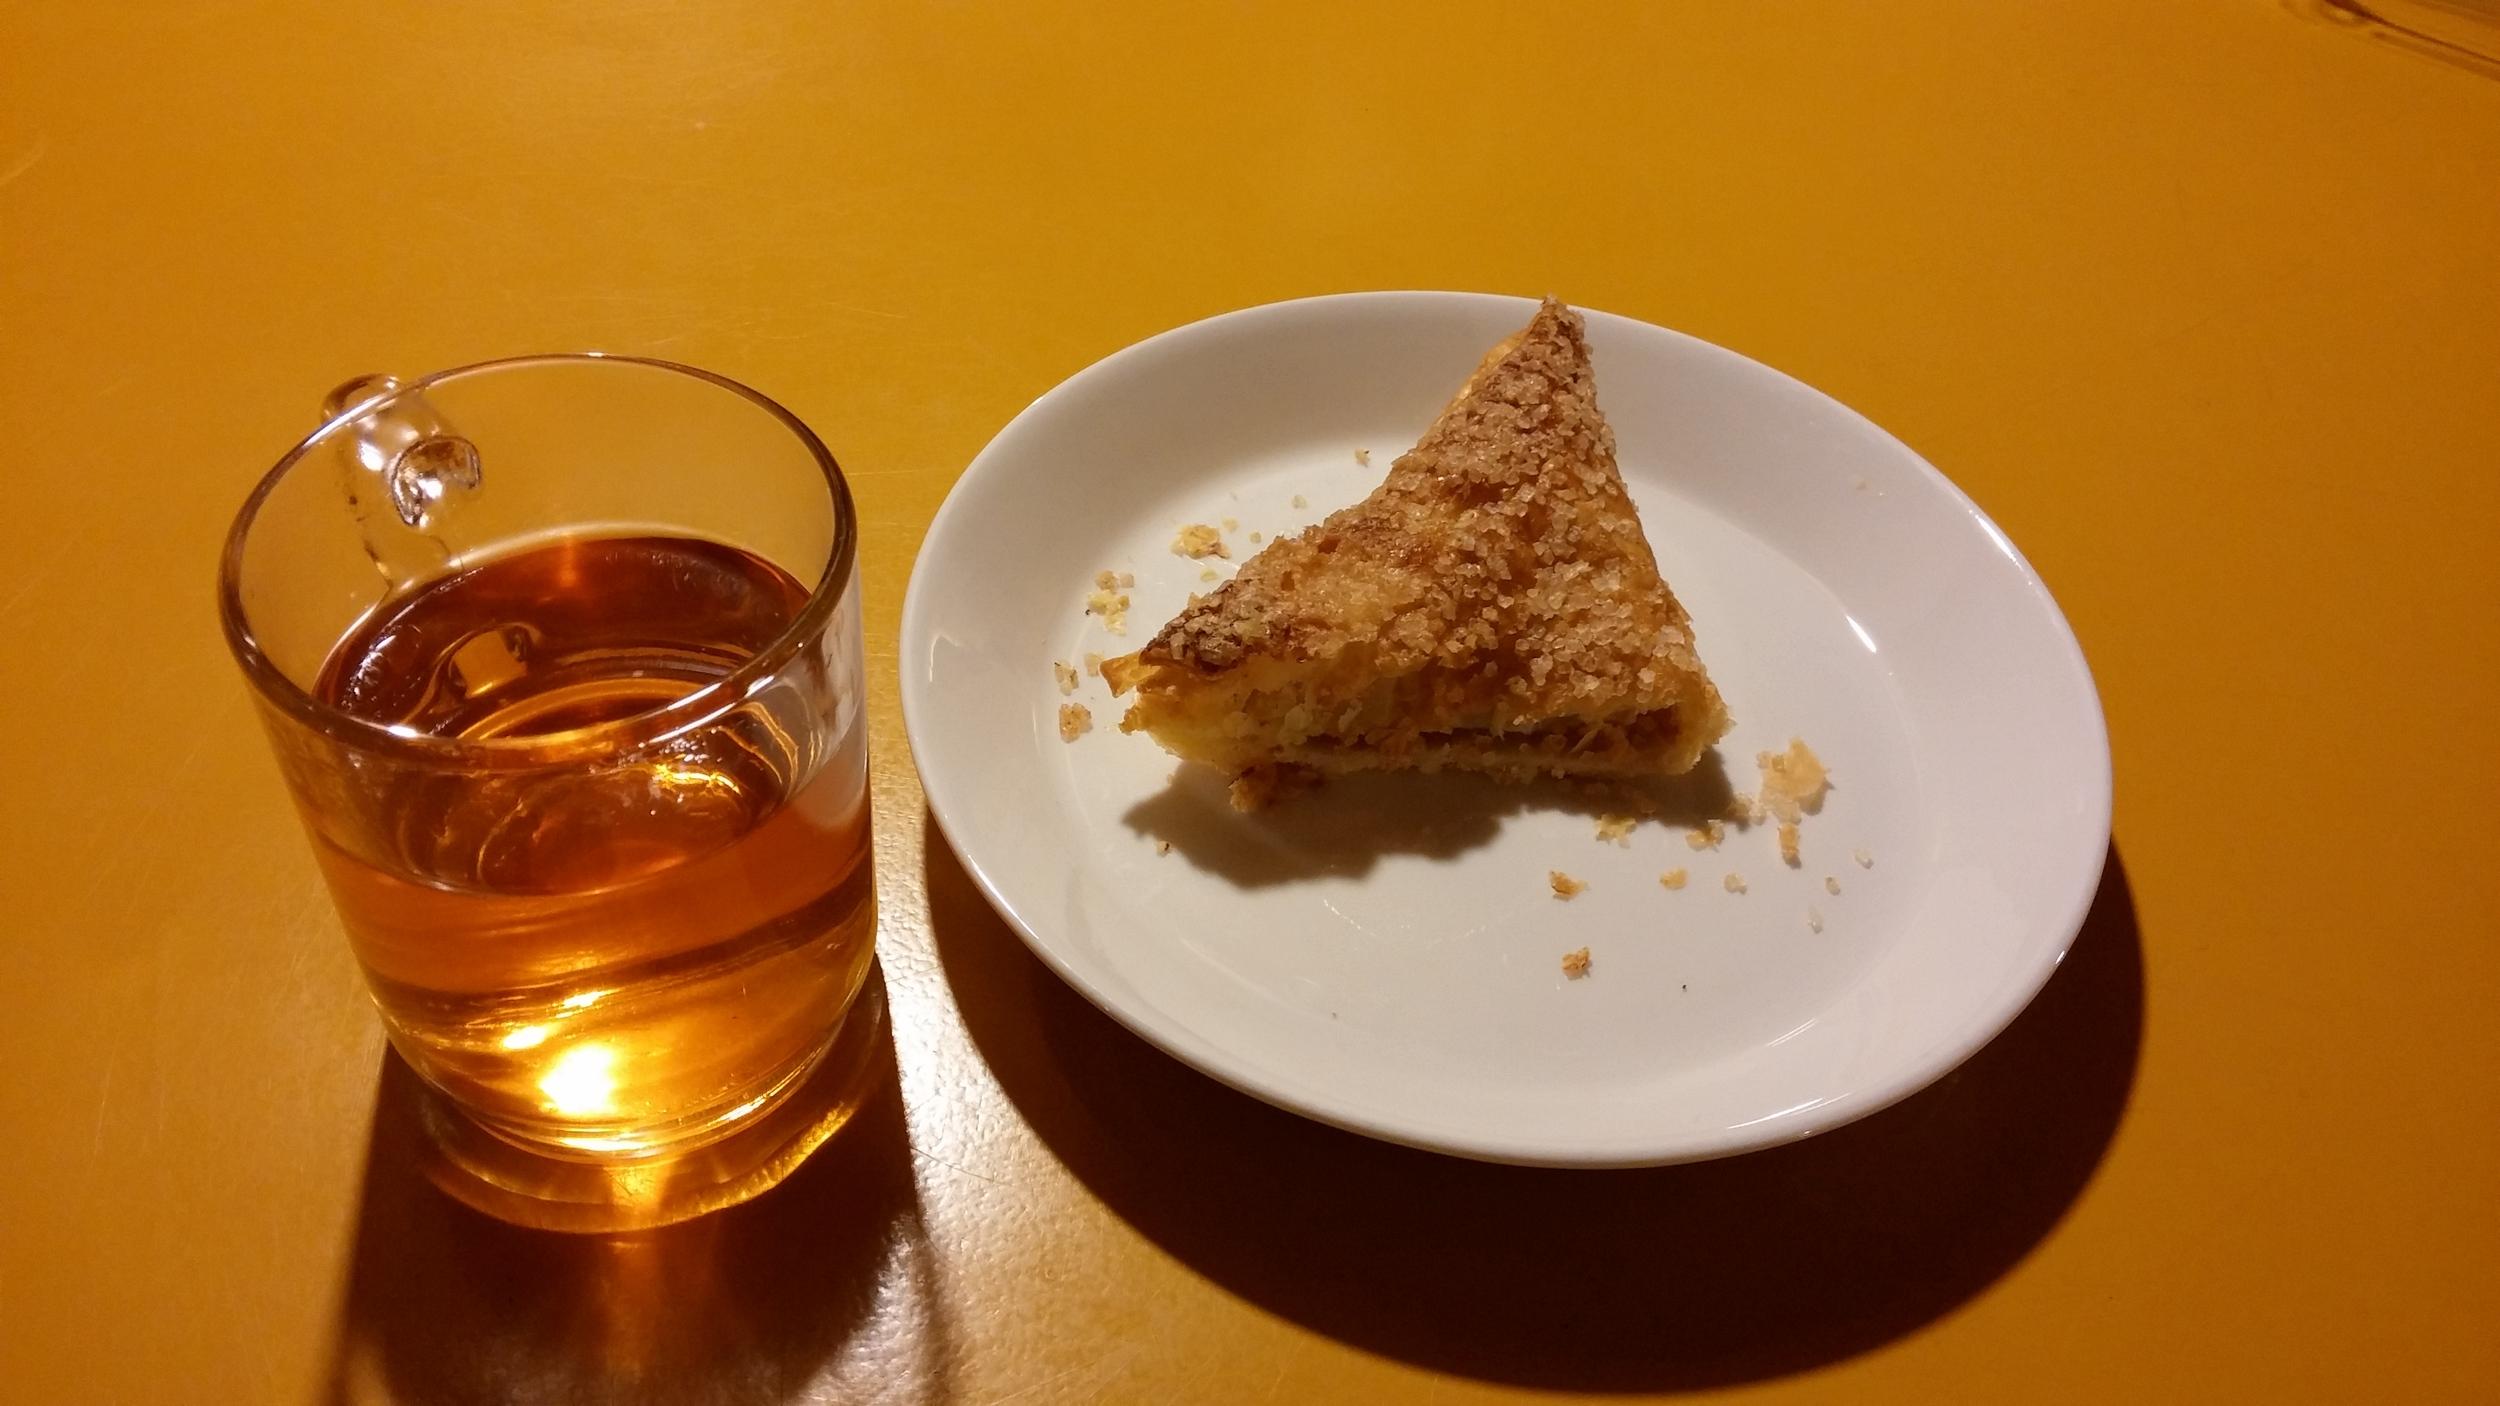 Appelflap and tea